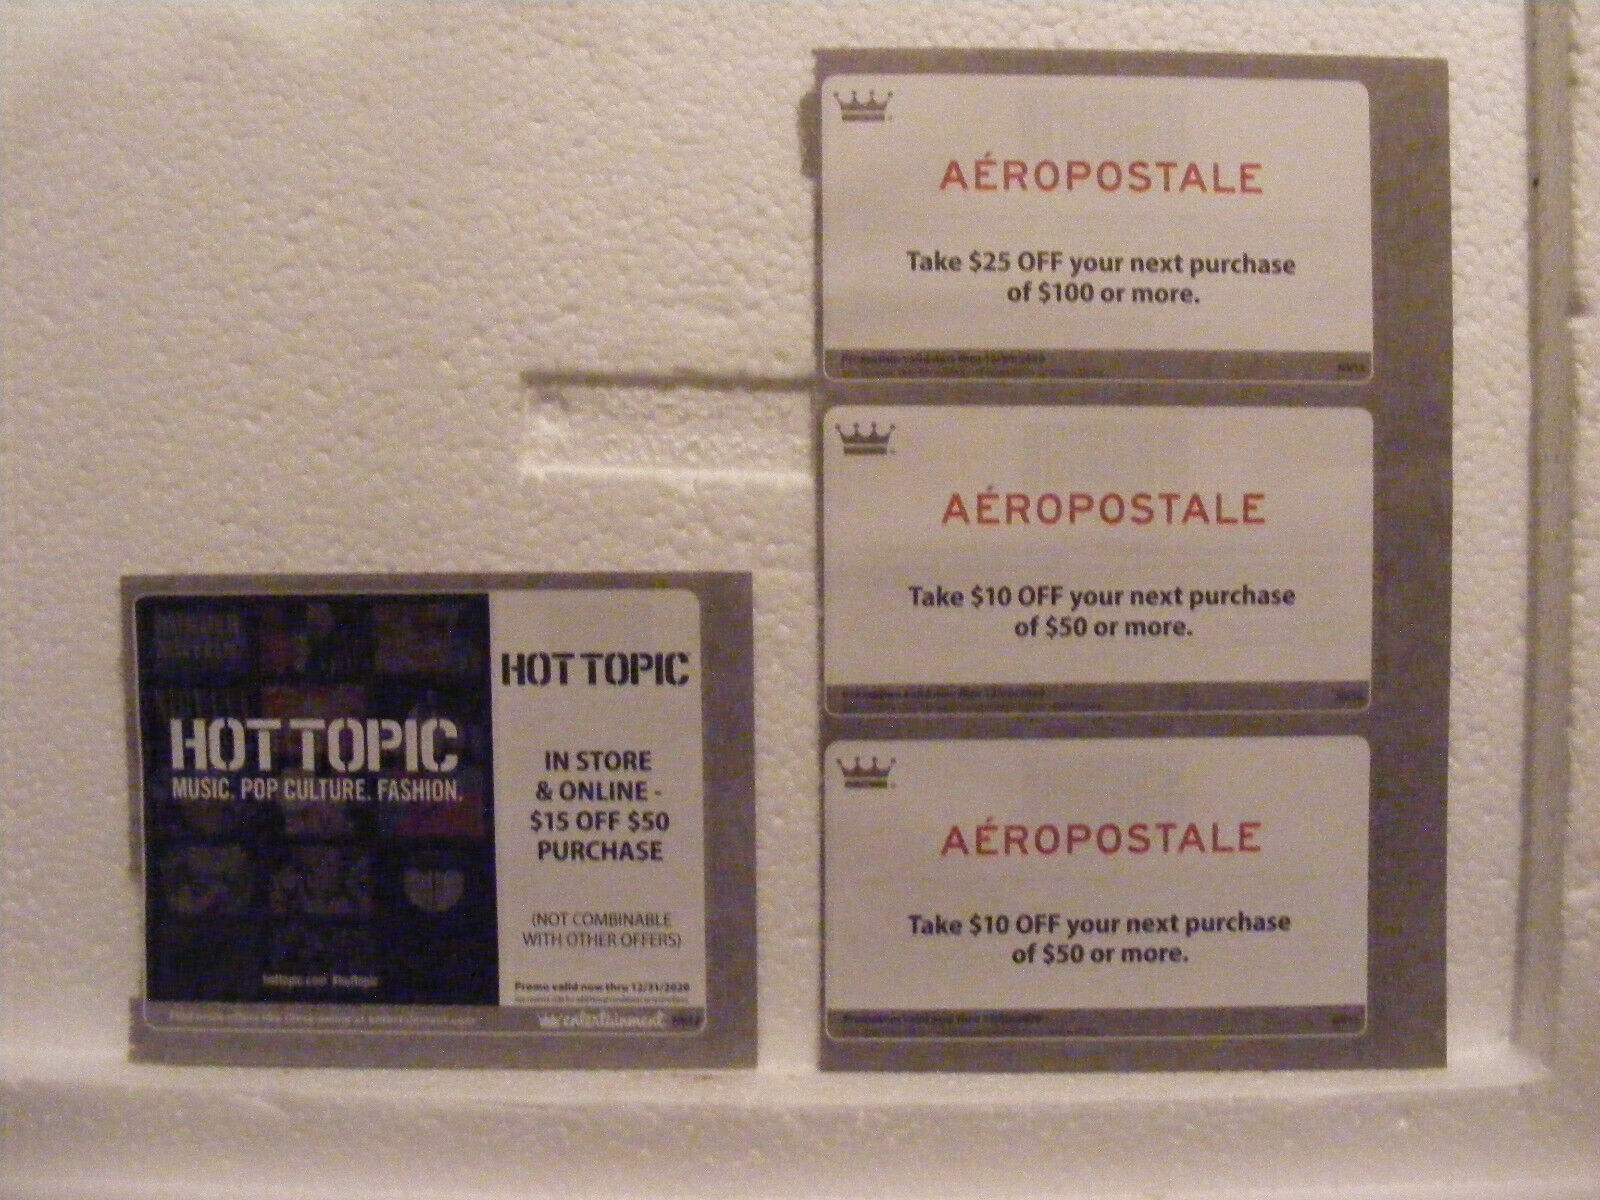 10 Off 50 25 Off 100 Aeropostale/ 15 Off 50 Hot Topic/Coupons Exp Dec 20 - $6.49